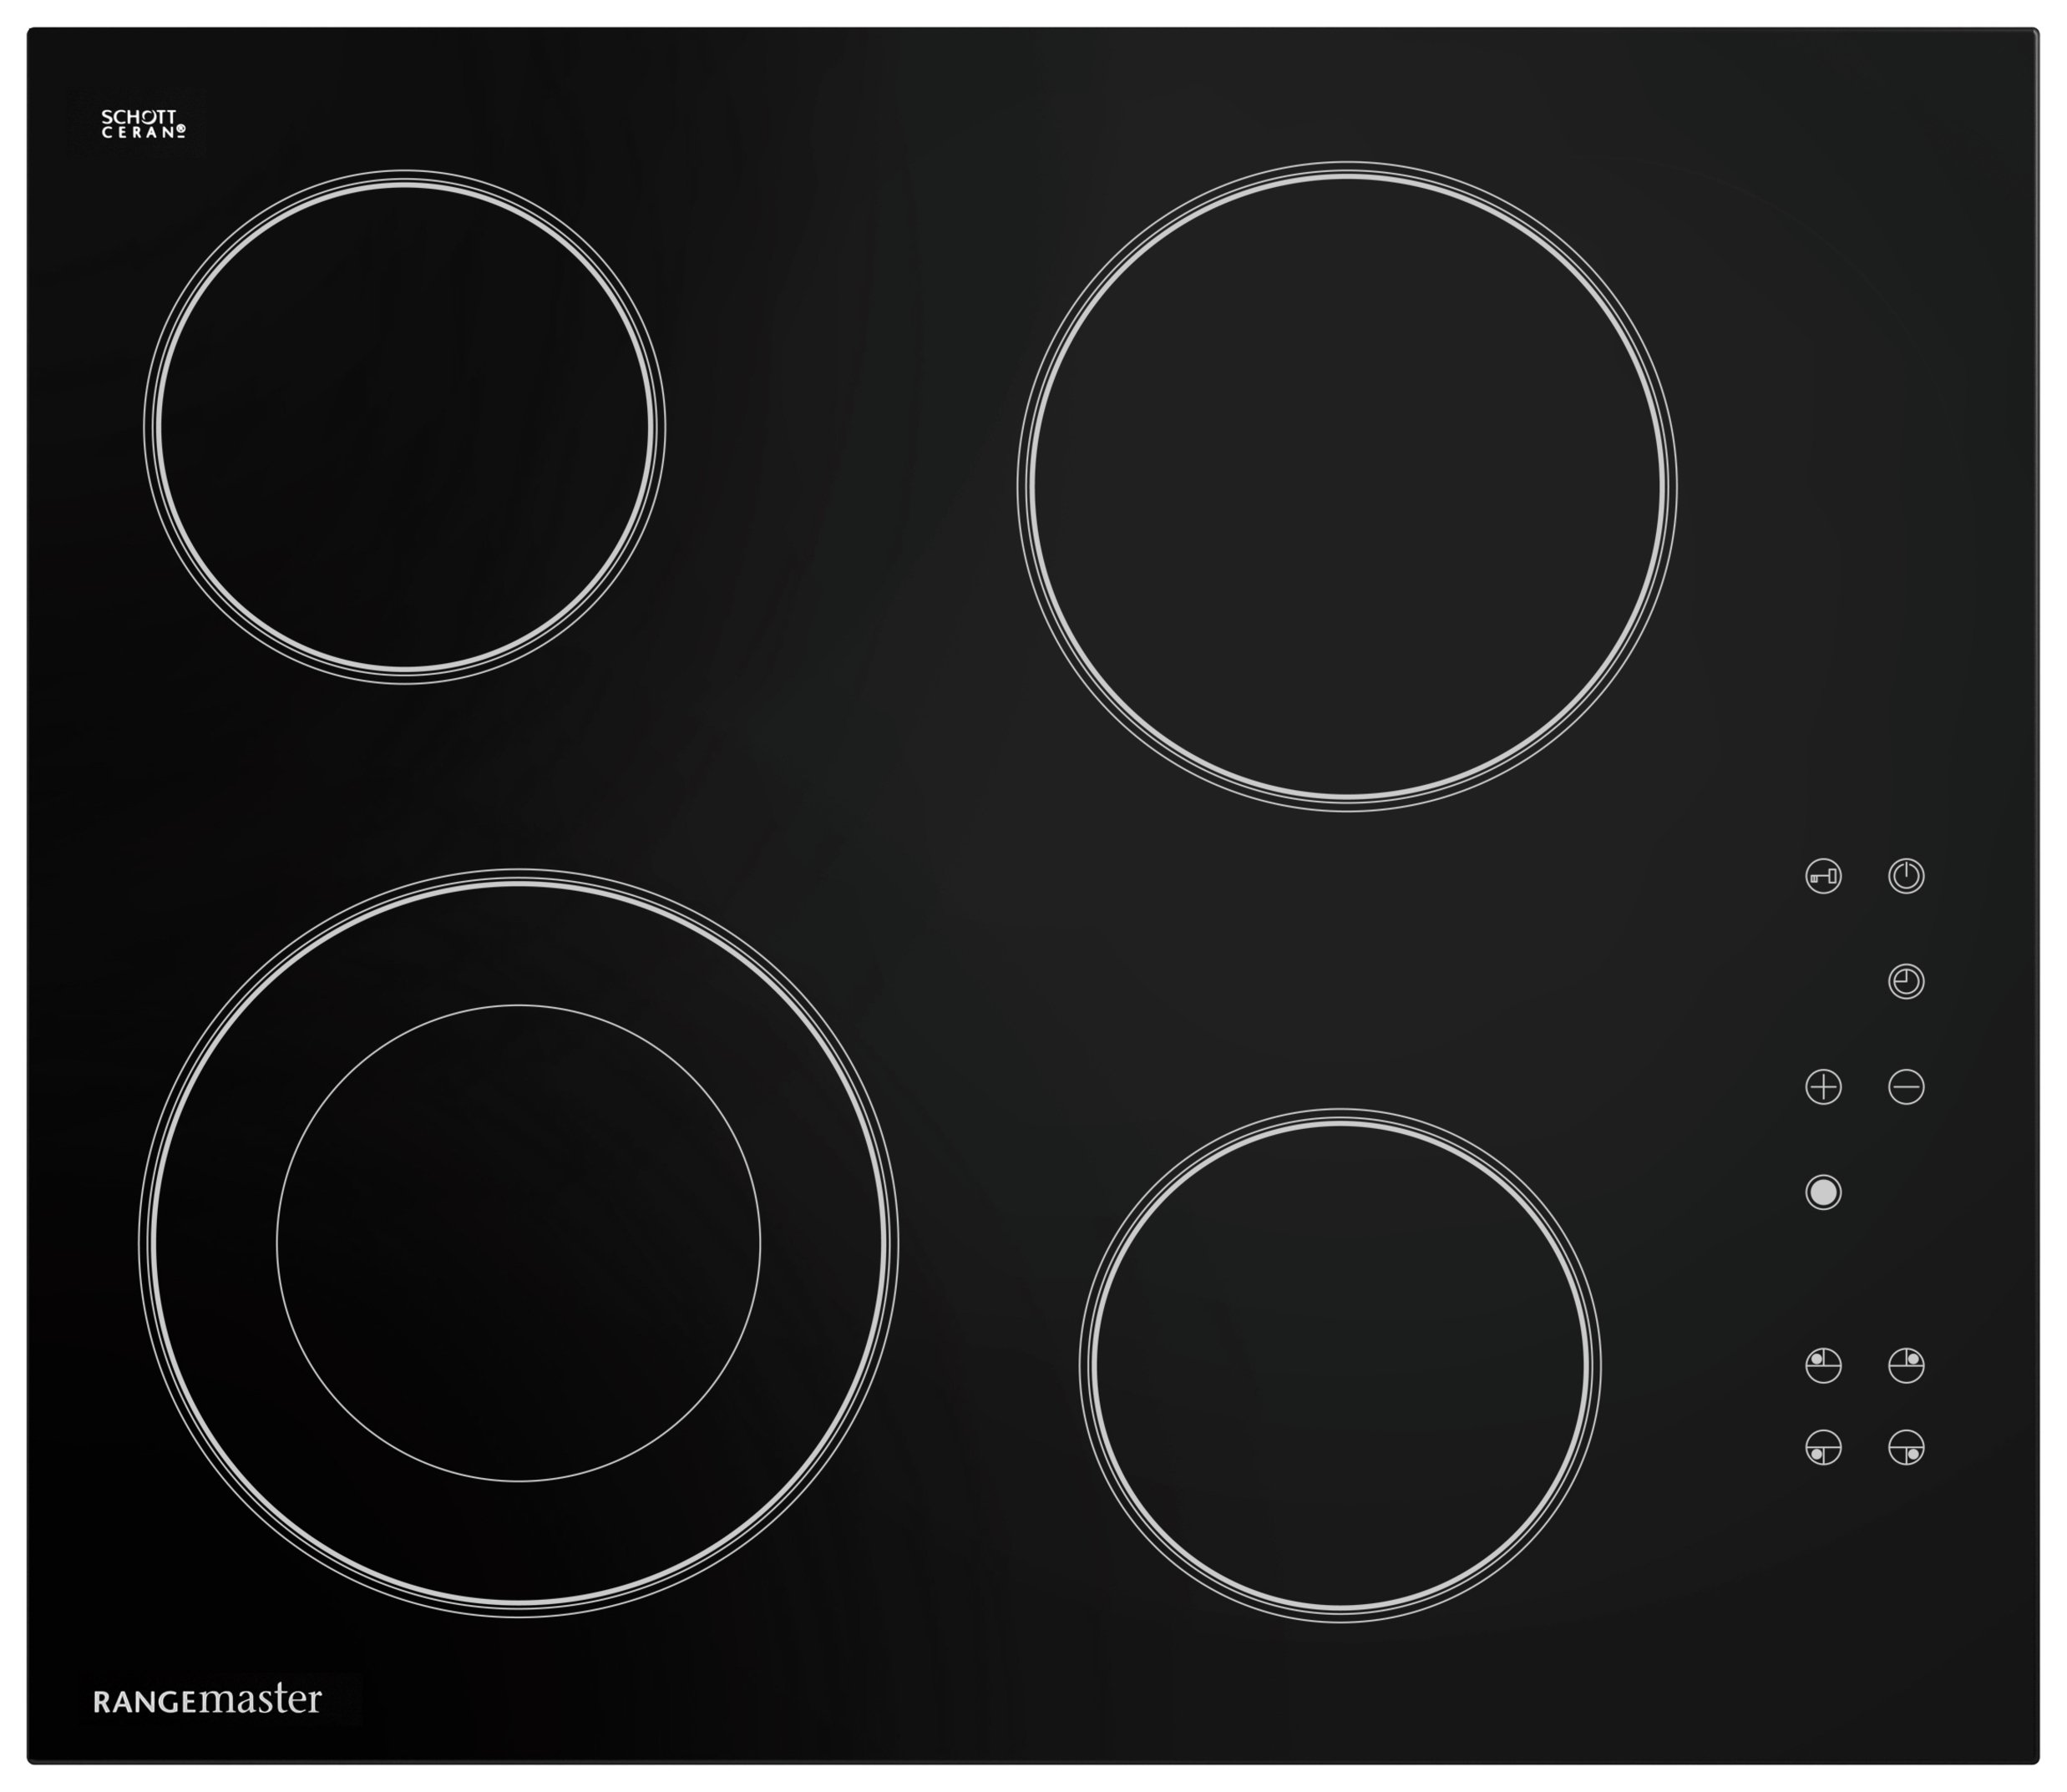 Rangemaster - 4 Zone - Ceramic Hob - Black